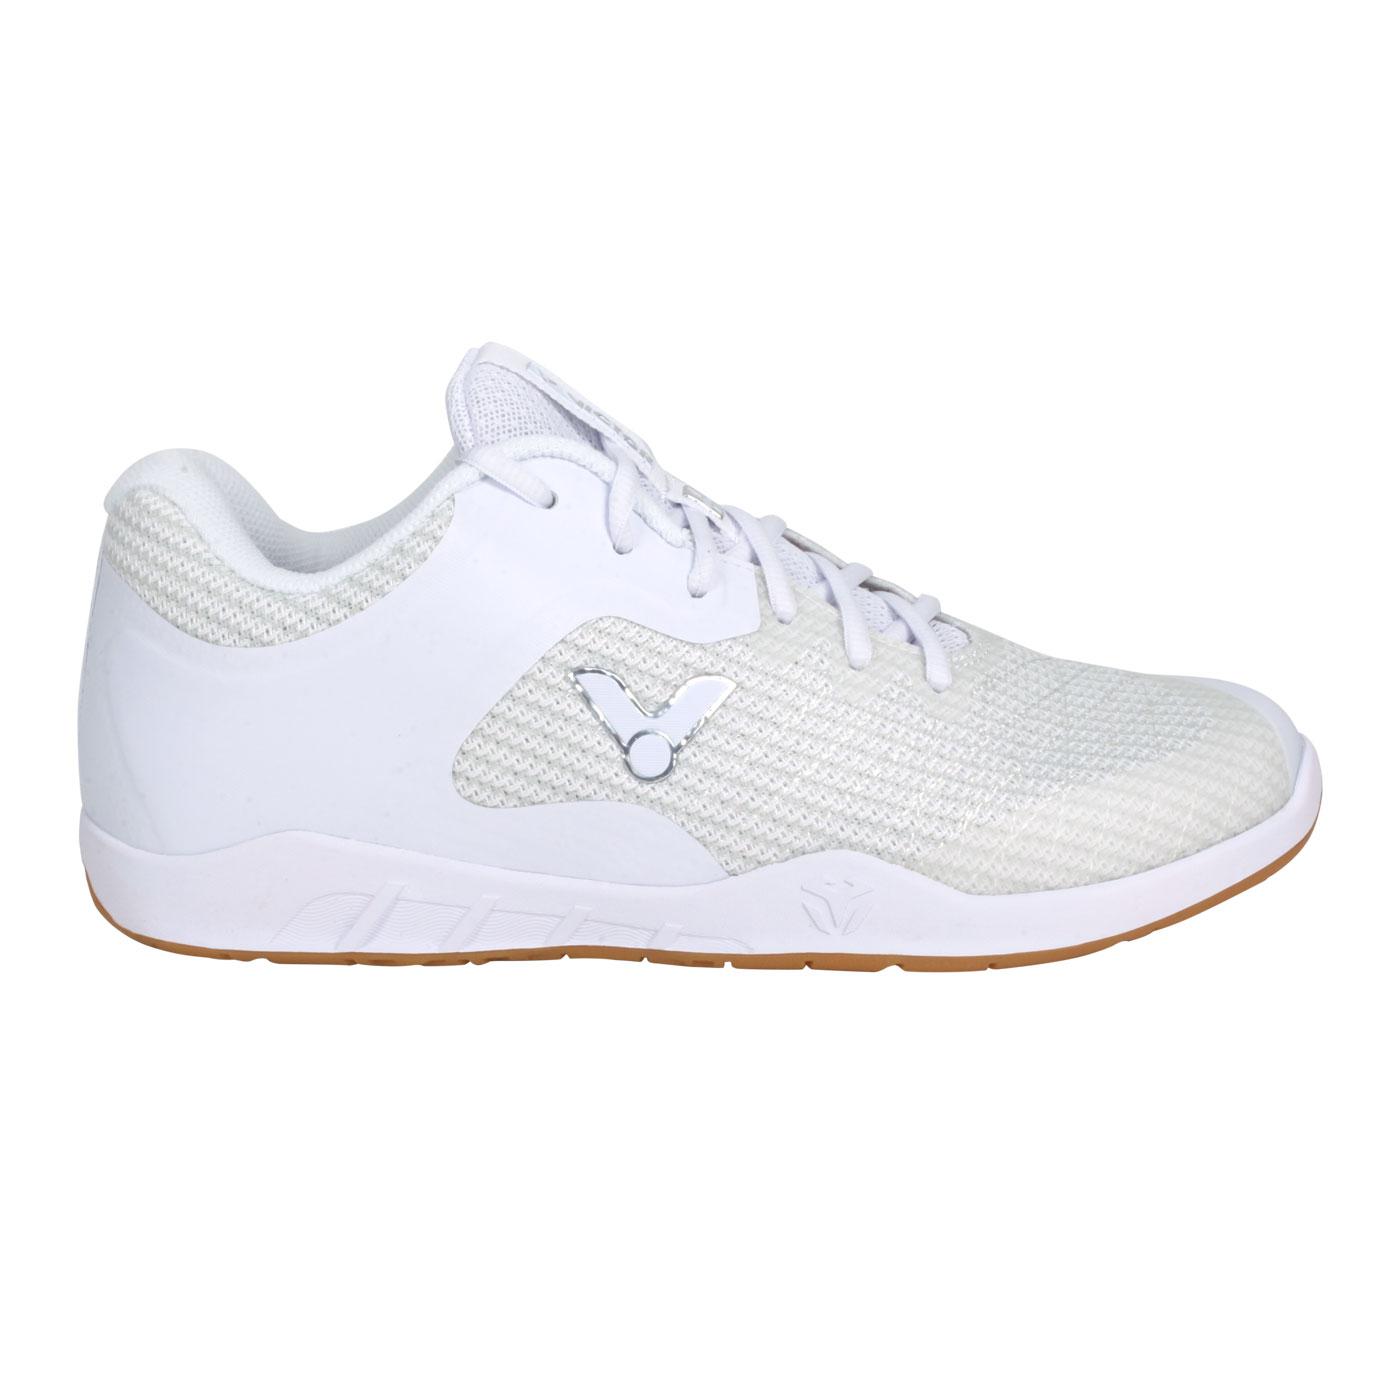 VICTOR 男款羽球鞋 VG1-A - 白銀